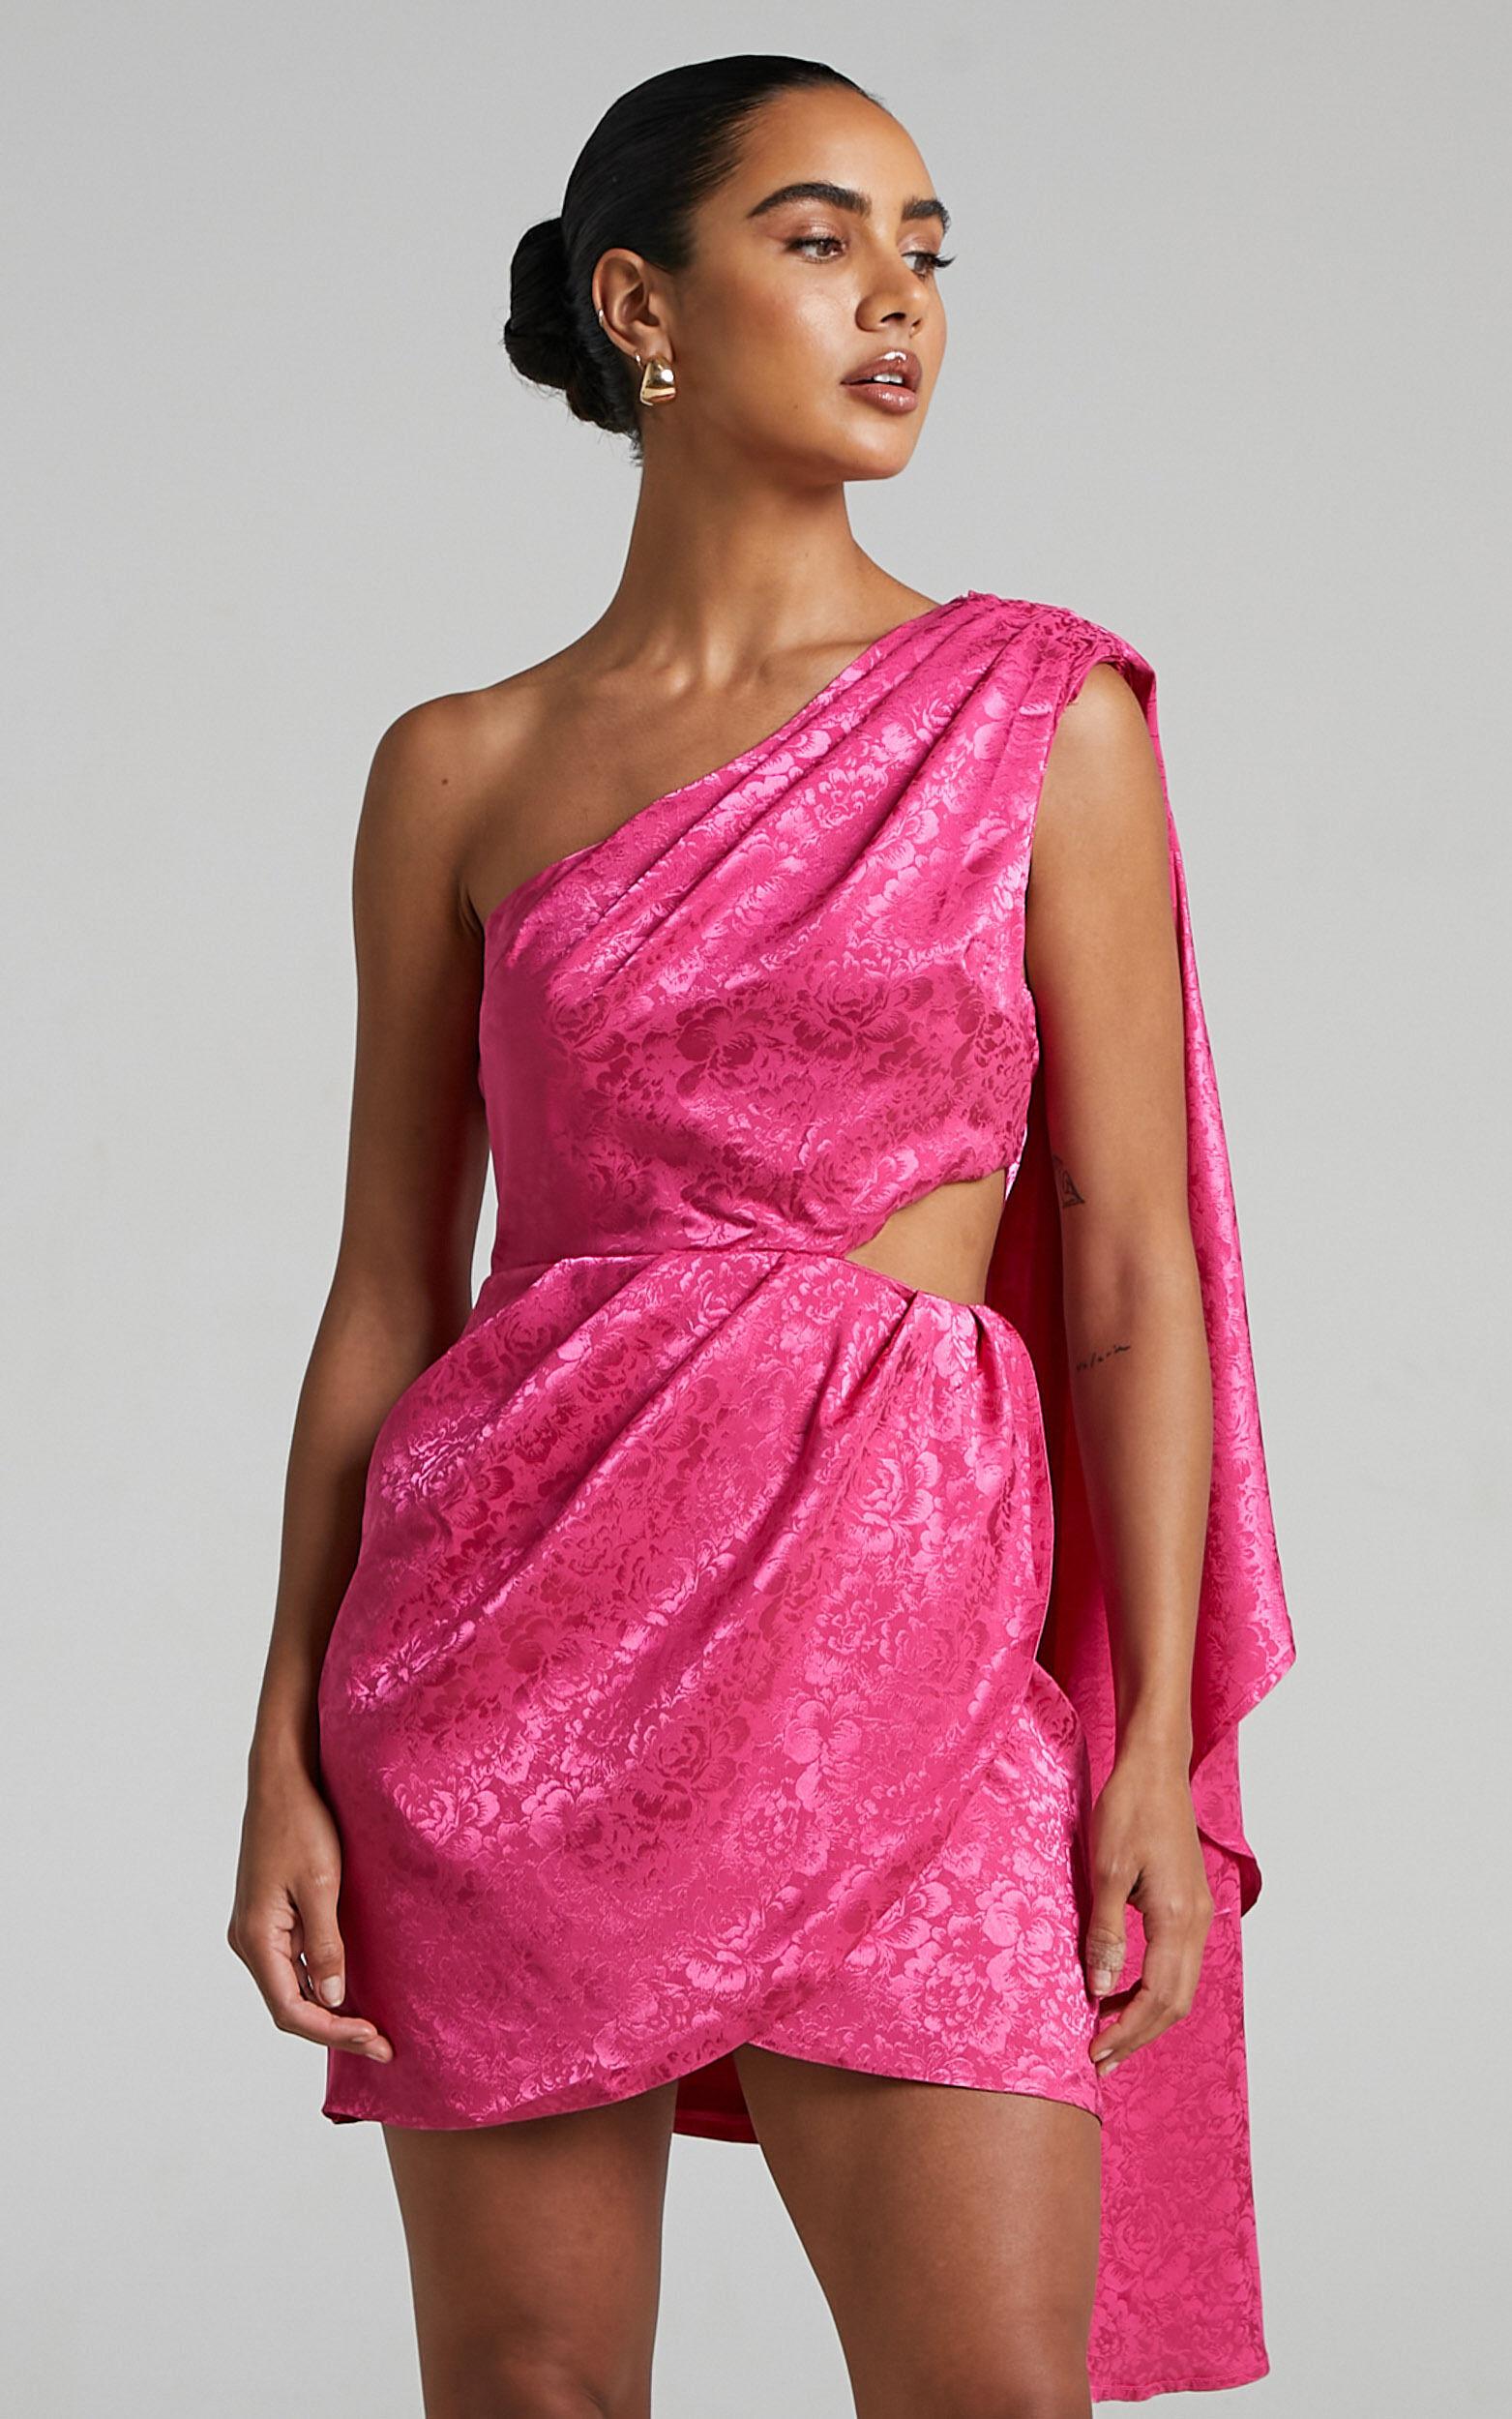 RUNAWAY THE LABEL - SERITA DRESS in Fuchsia - L, PNK2, super-hi-res image number null